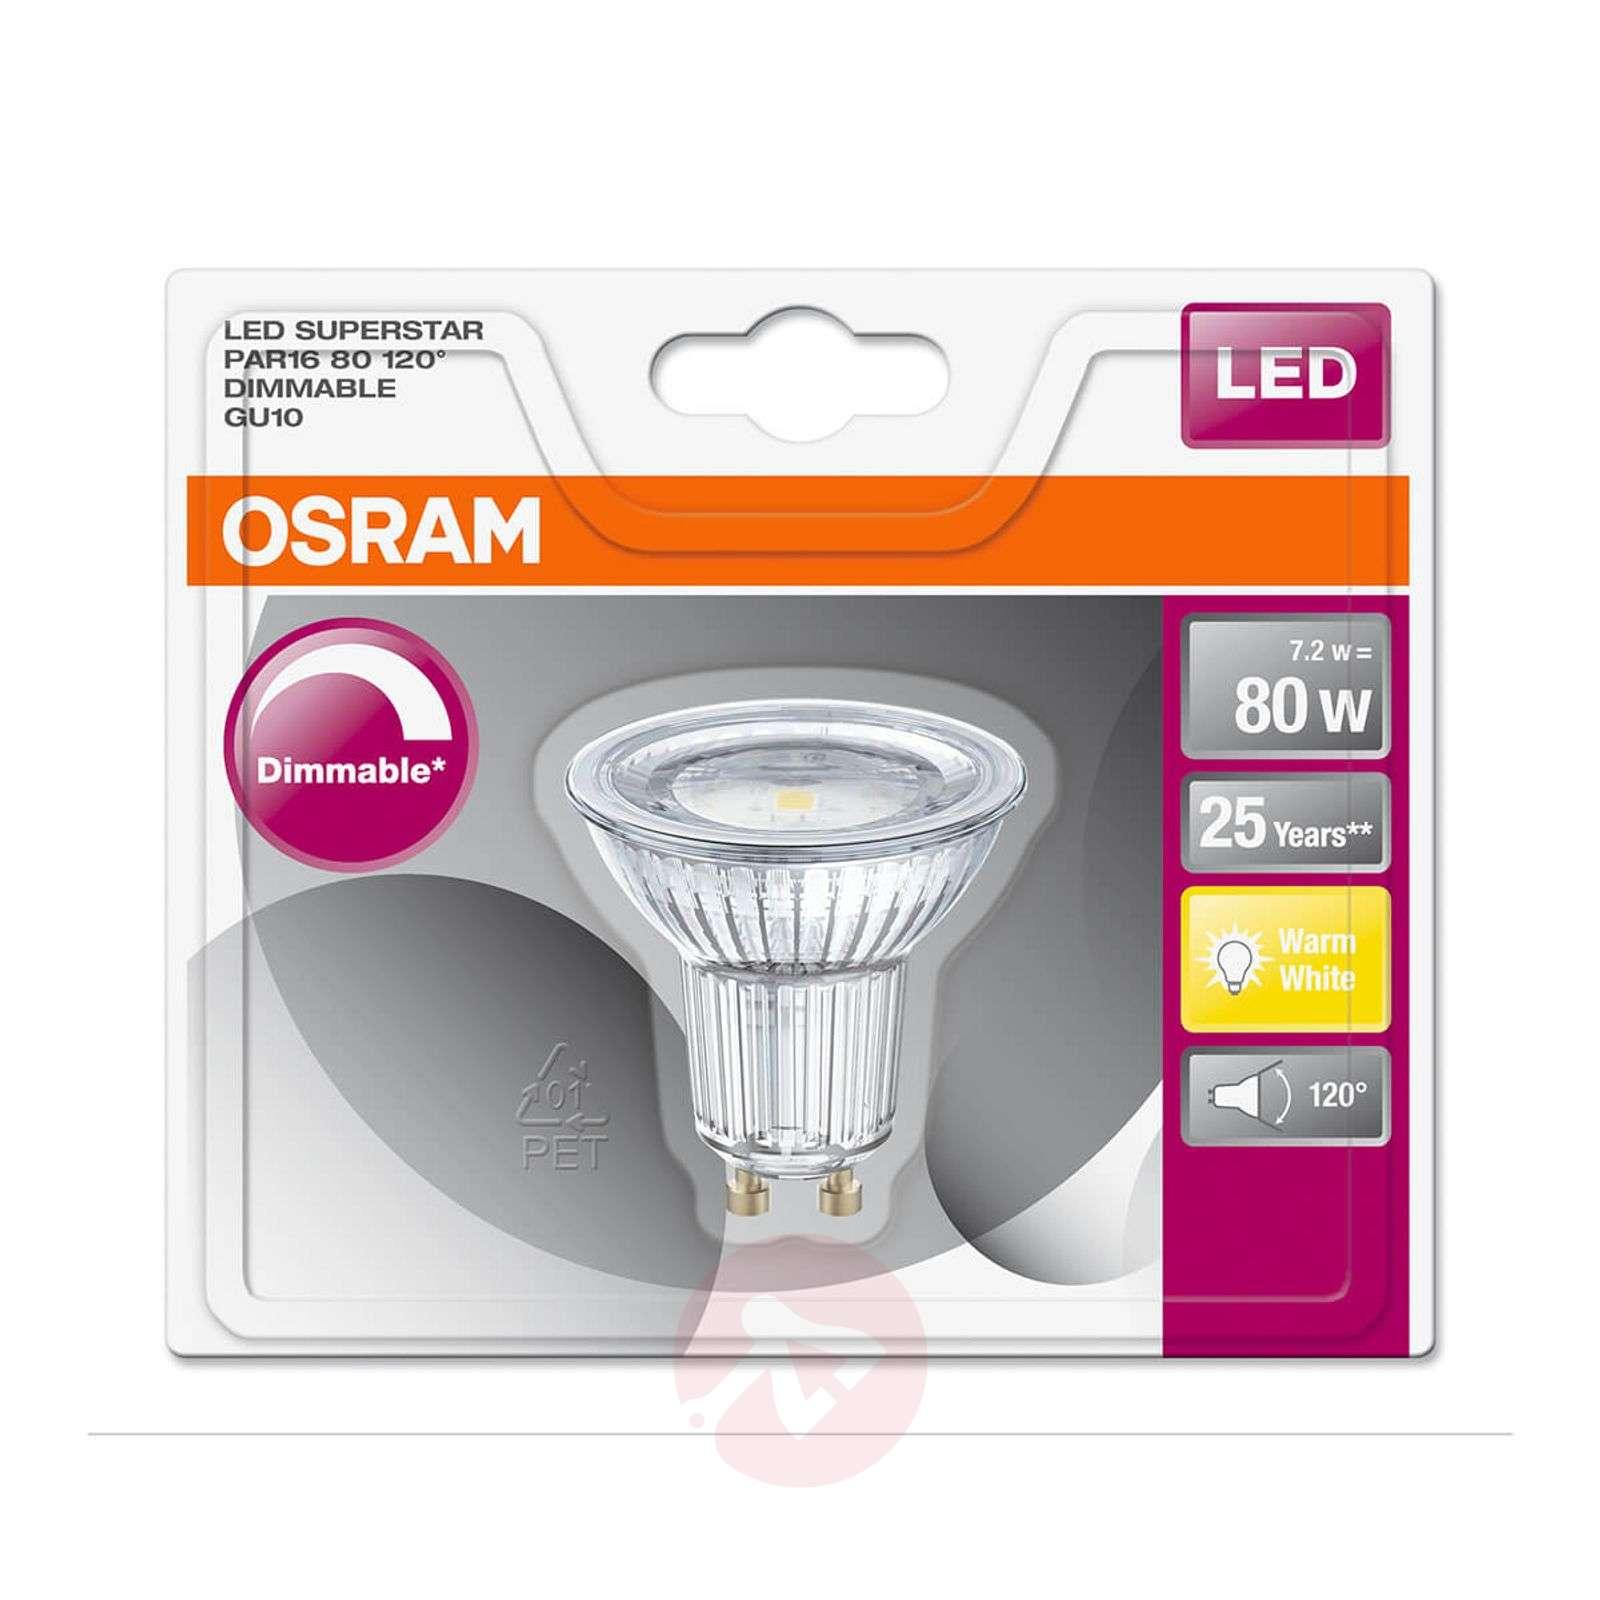 LED-heijastinlamppu 120degree GU10 7,2 W, himmennettävä-7262054X-01